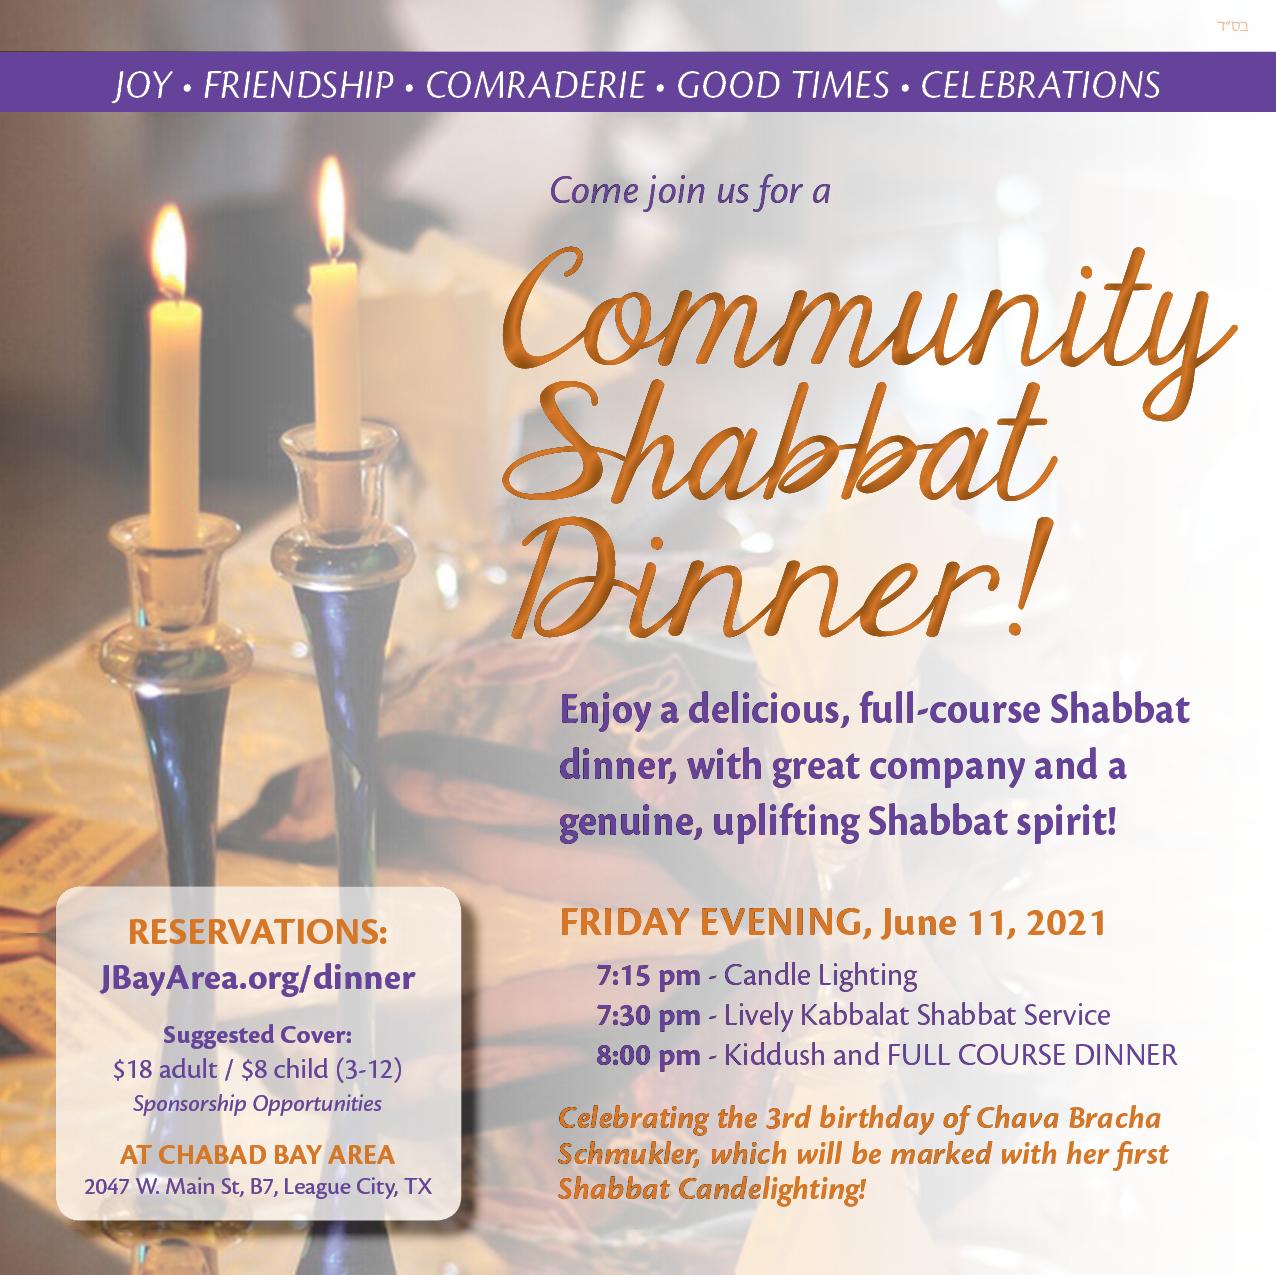 Community-Shabbat-Dinner--Jun-11-21